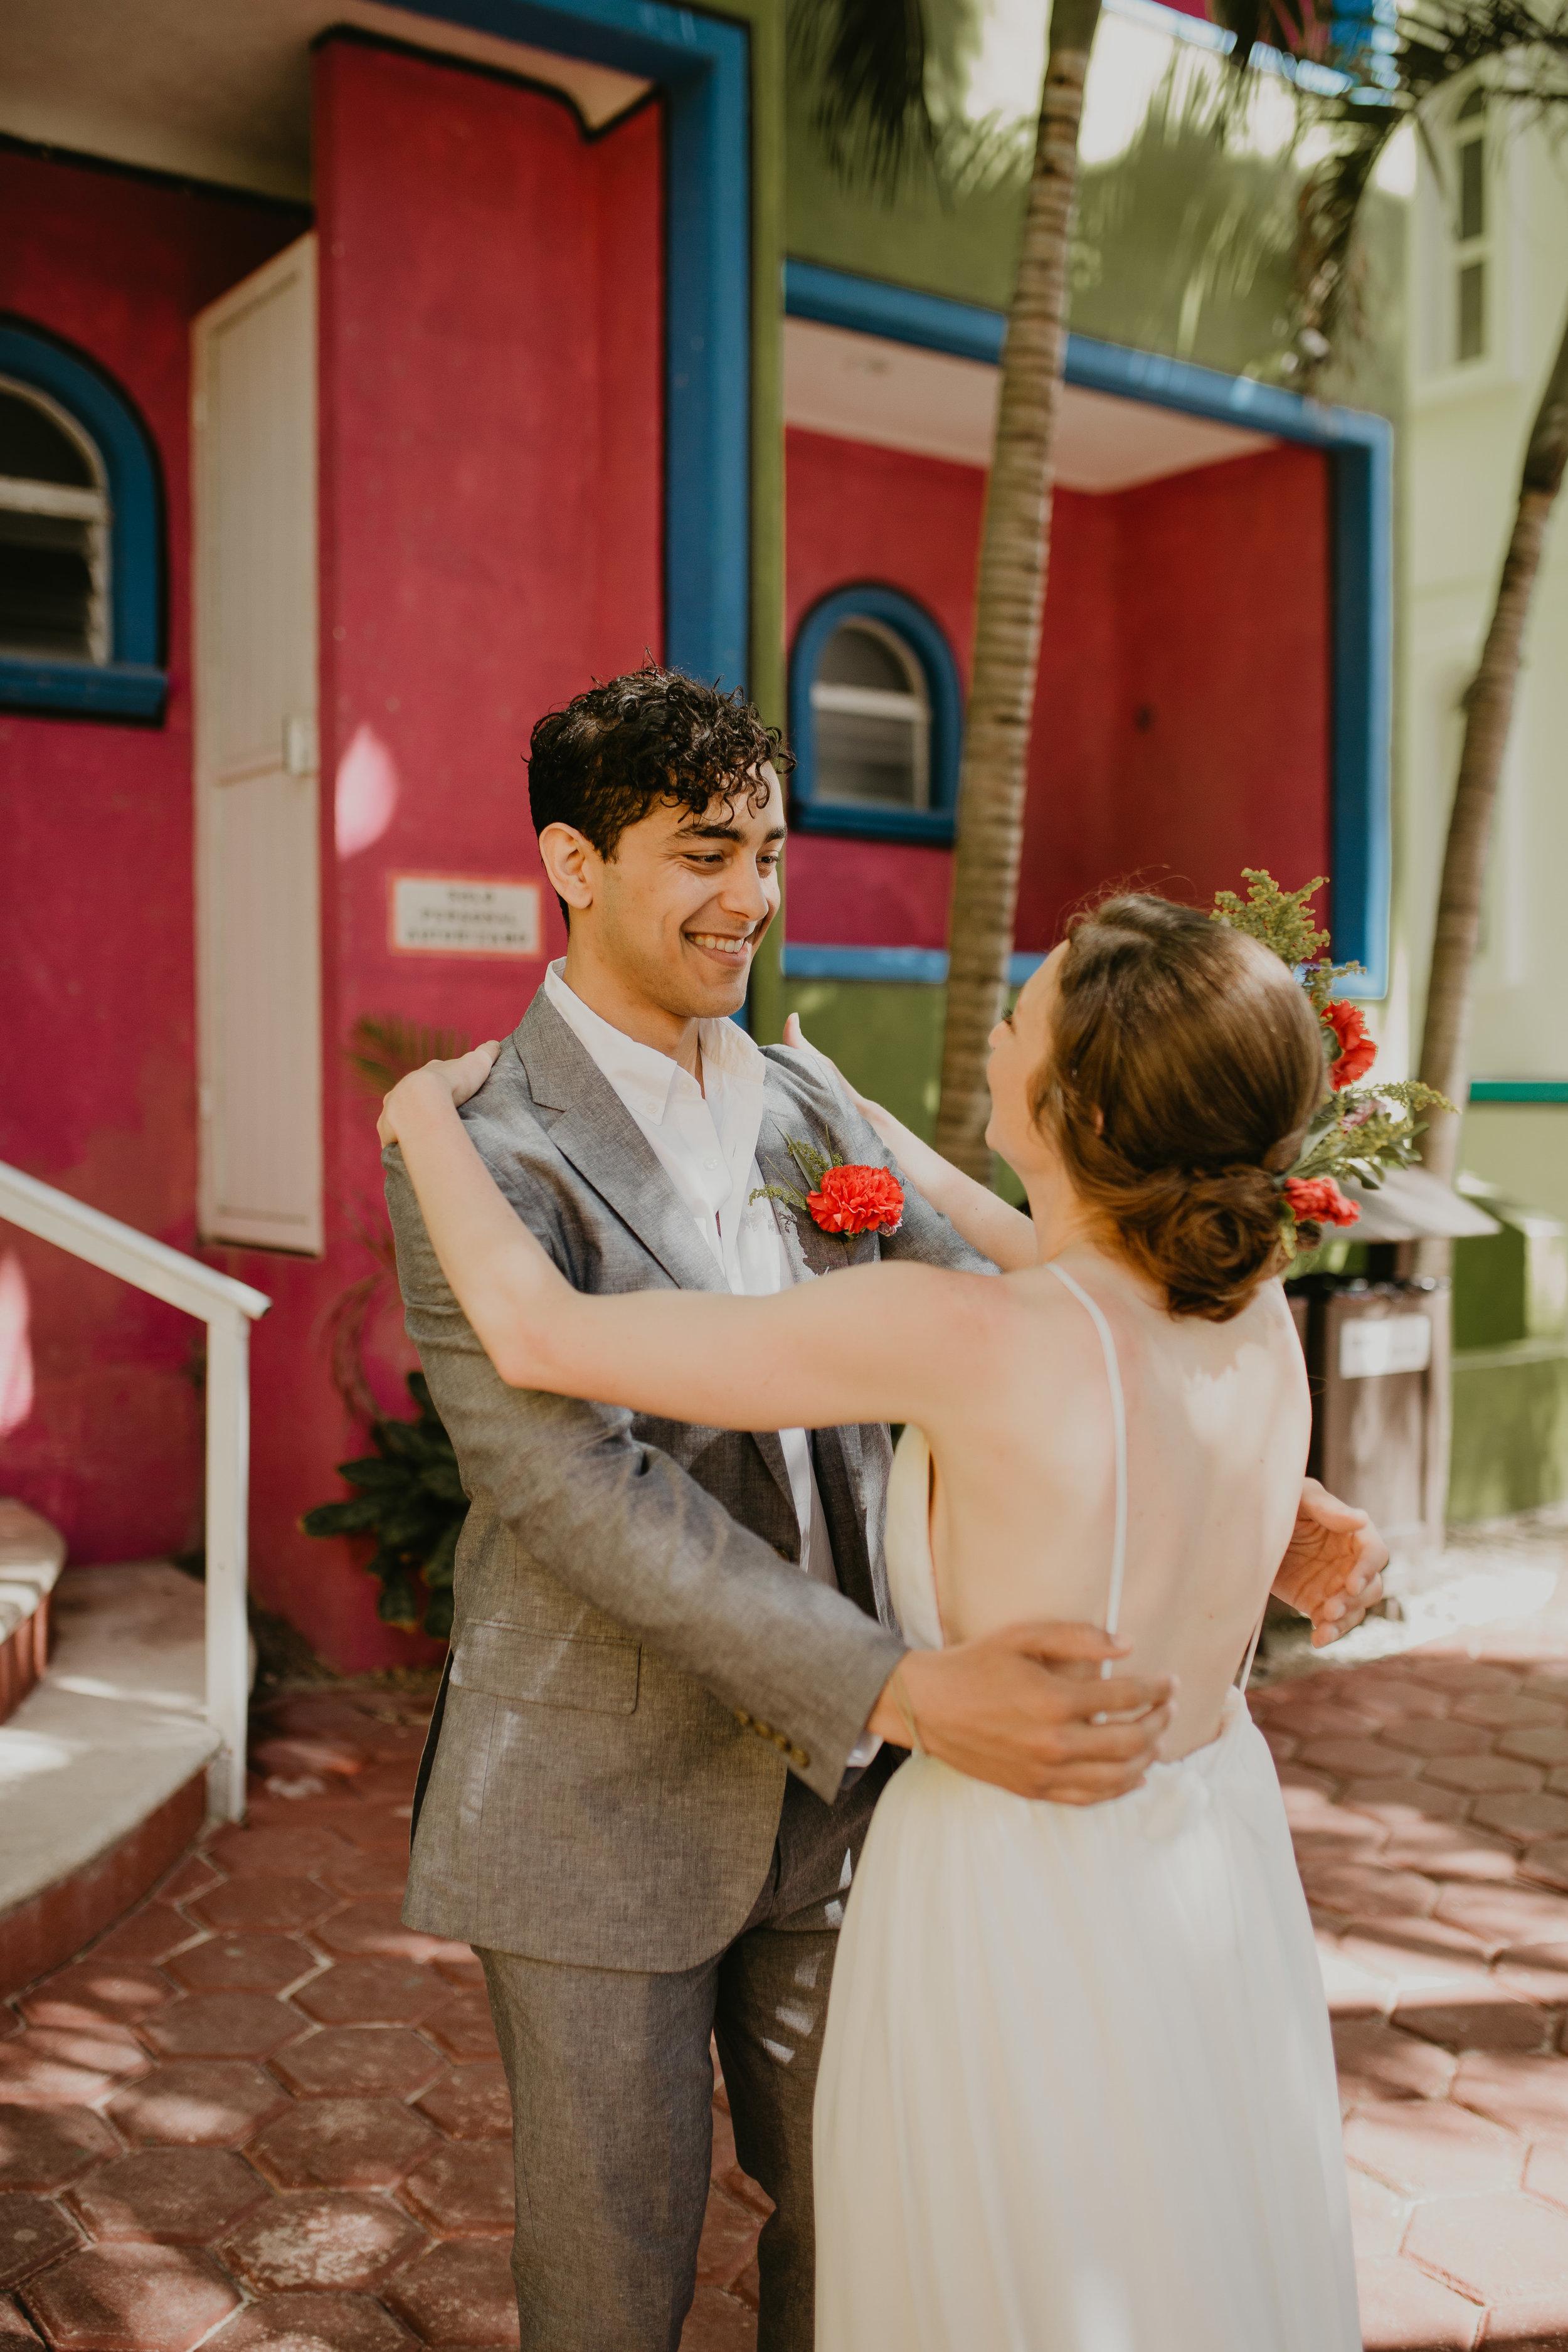 Nicole-Daacke-Photography-beachfront-akumal-destionation-wedding-tulum-mexico-elopement-photographer-destination-wedding-inspiration-sunset-champagne-pop-boho-bride-ocean-tropical-bohemian-tulum-wedding-photos-104.jpg